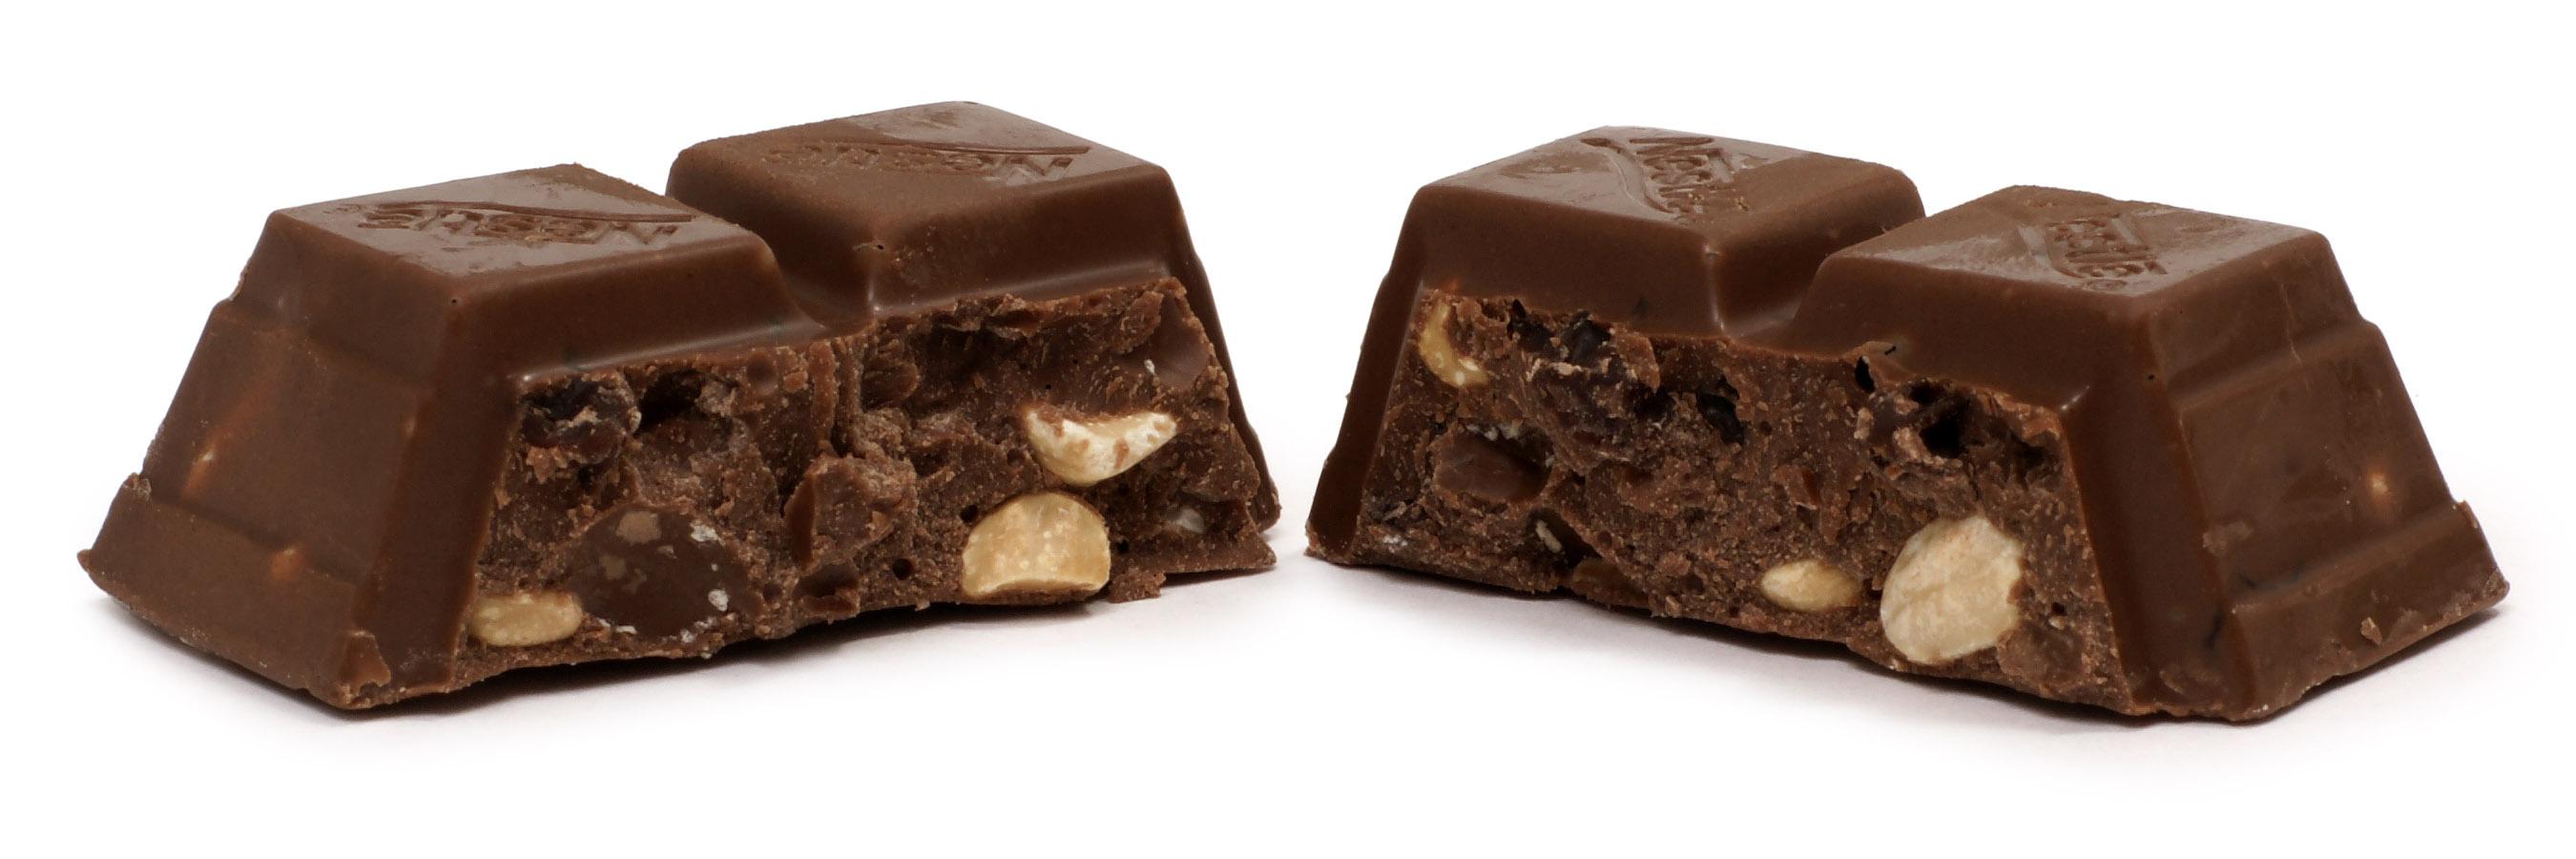 Chocolate Chocolate Split In Half